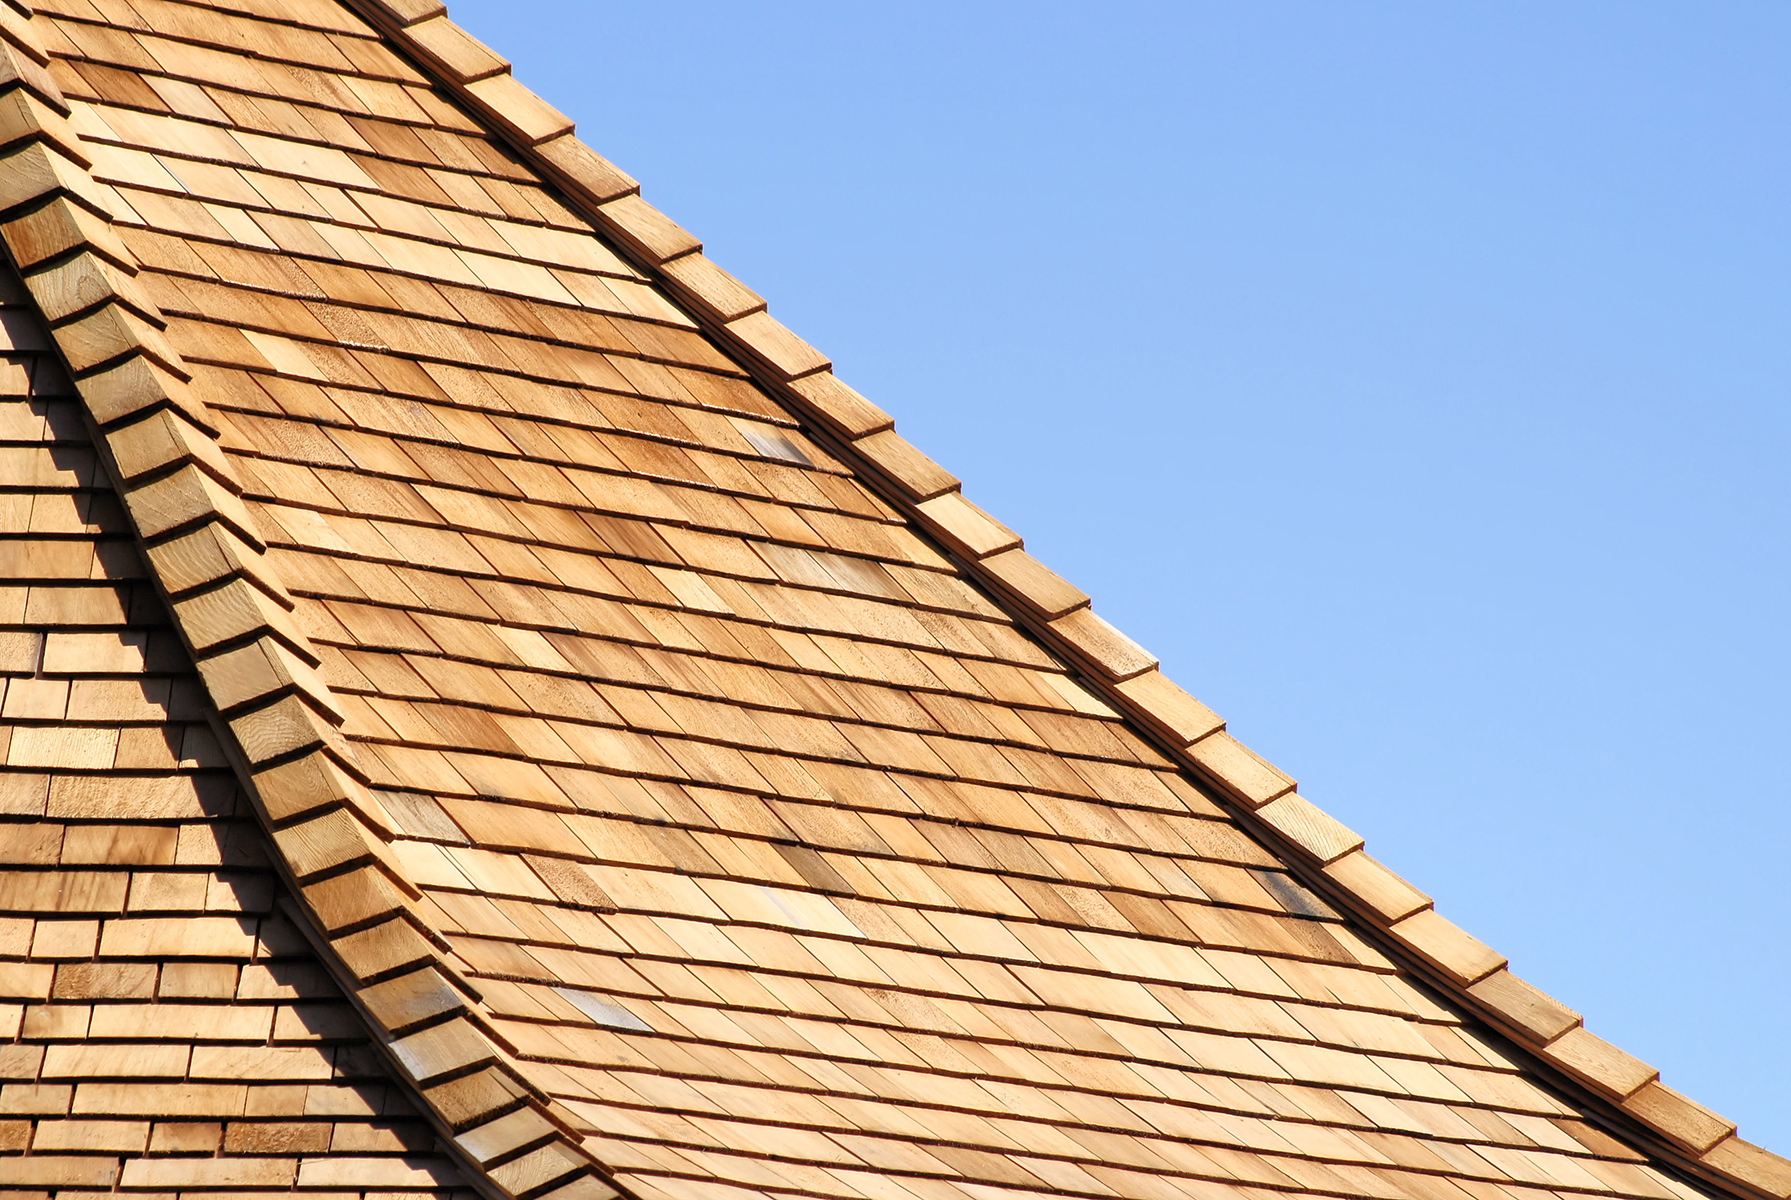 Country-Lumber-Shingle-Roofing.jpg